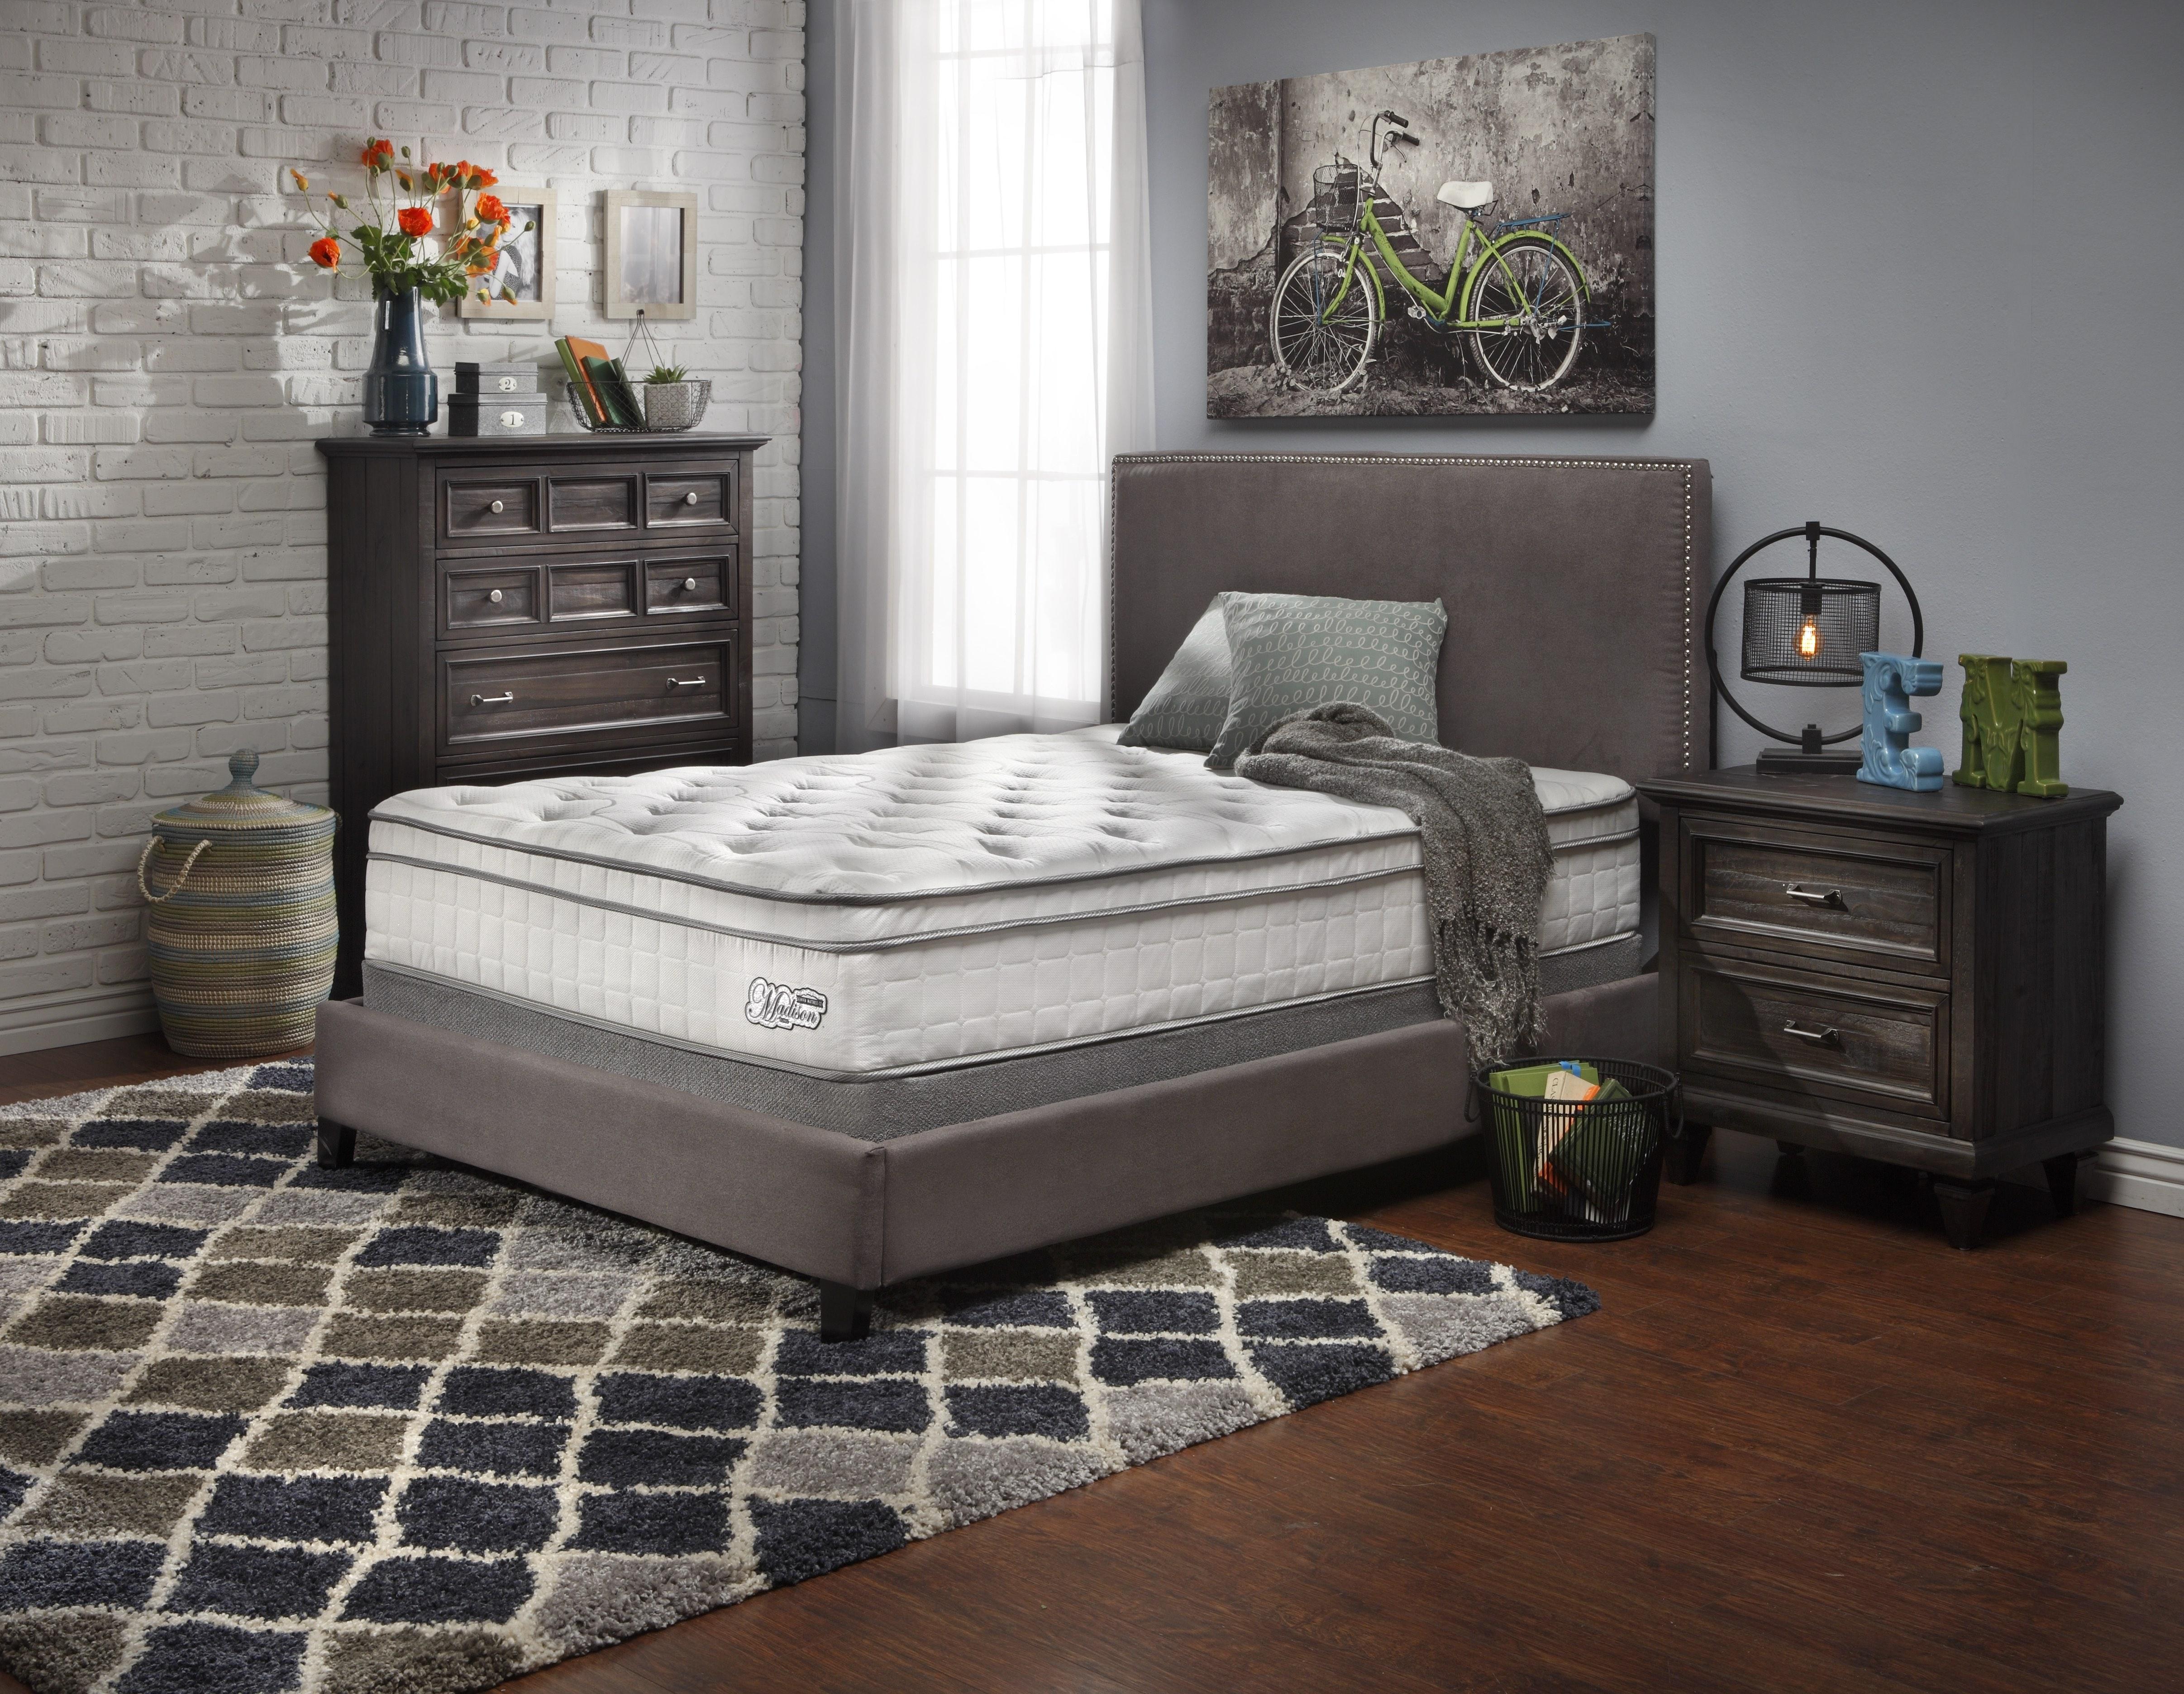 denver mattress company 2620 s 25th e idaho falls id 83404 yp com